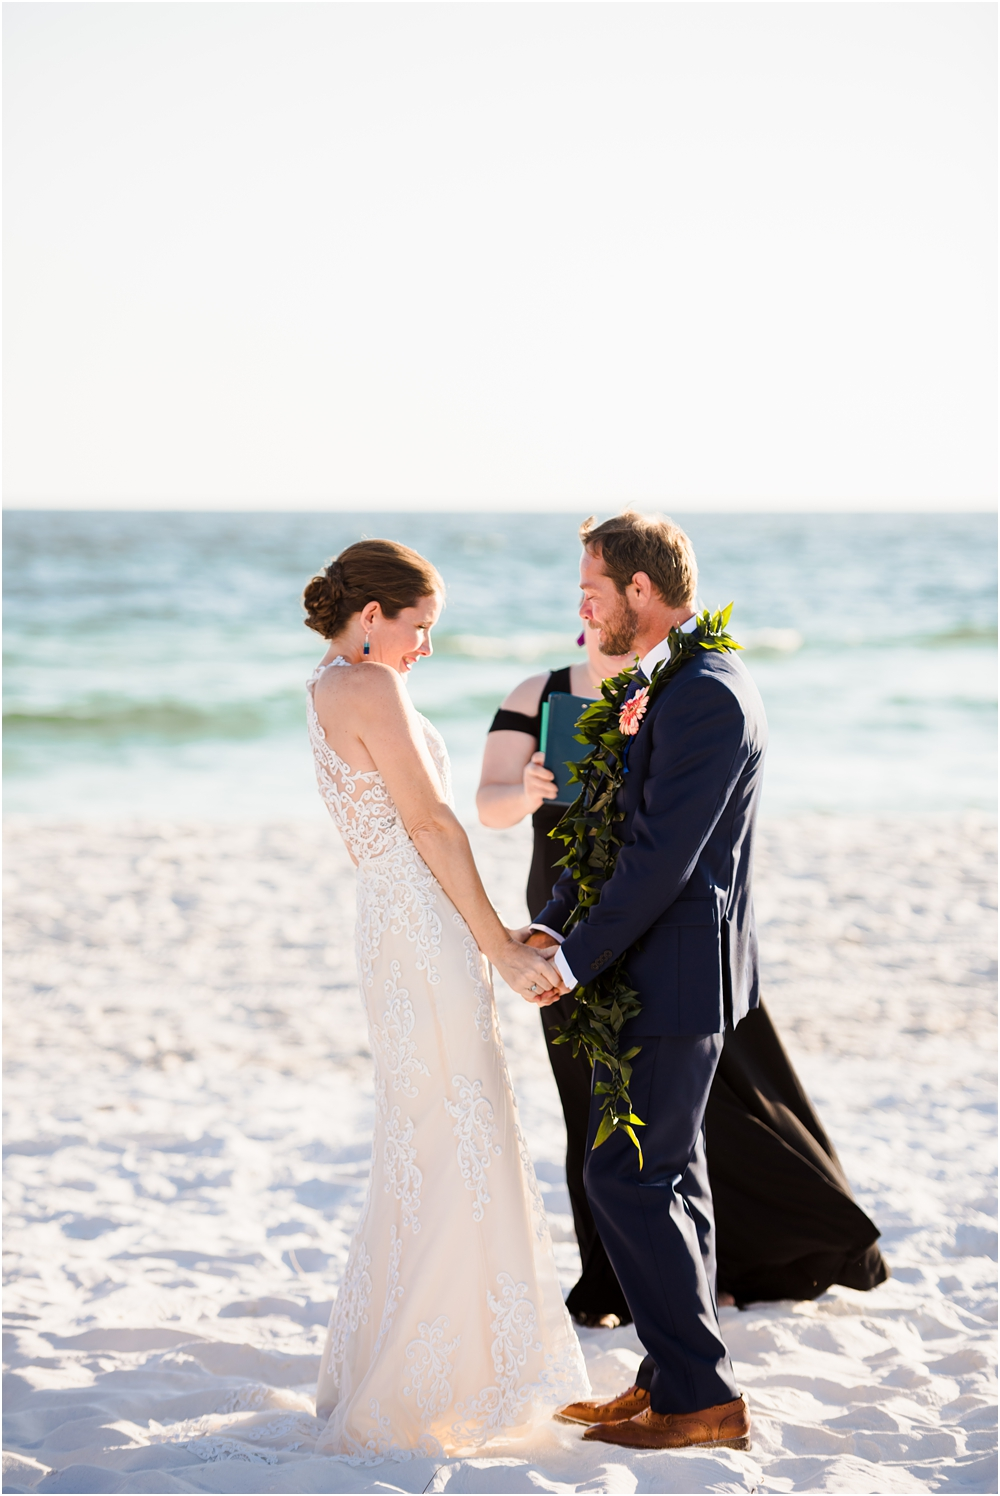 ledman-wedding-kiersten-stevenson-photography-30a-panama-city-beach-dothan-tallahassee-(249-of-763).JPG